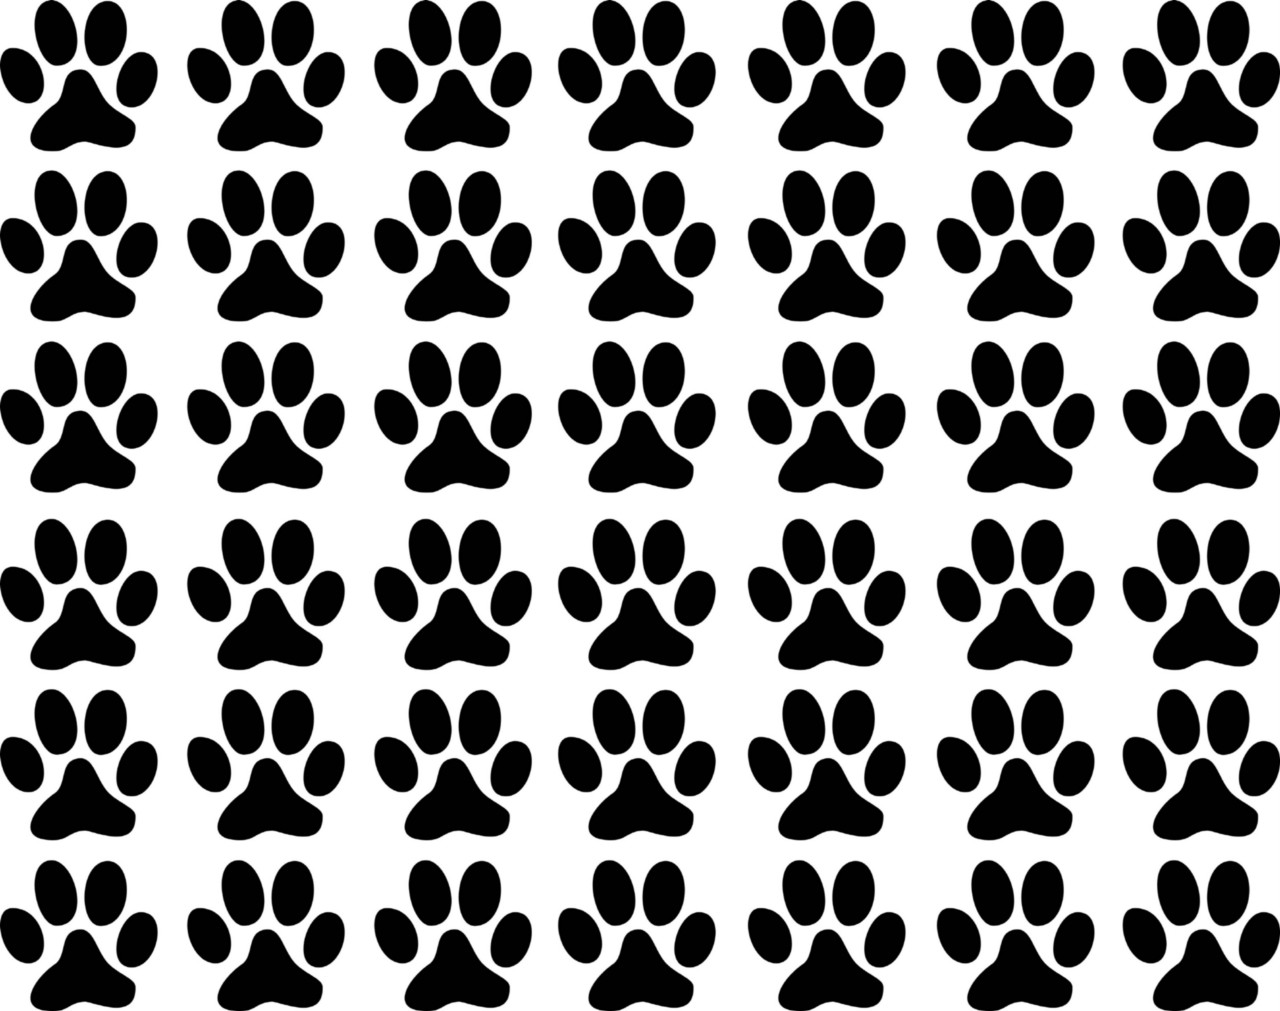 42 1 inch Paw Prints Tracks dog cat Vinyl Decal Wall Art Decor